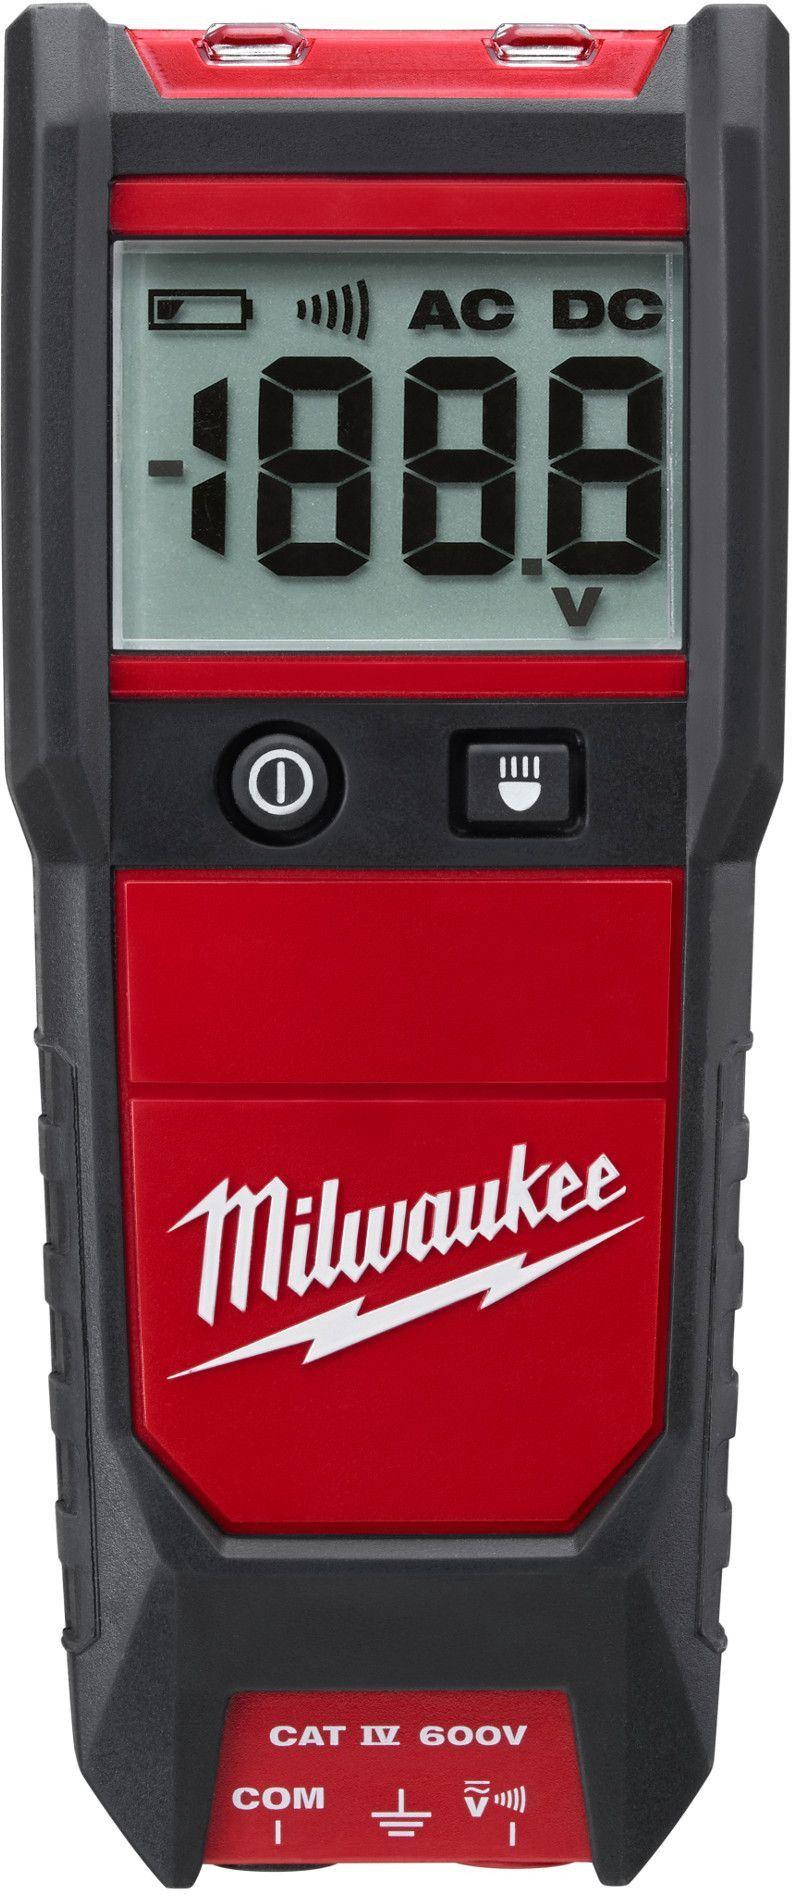 Milwaukee 221220 auto voltage continuity tester